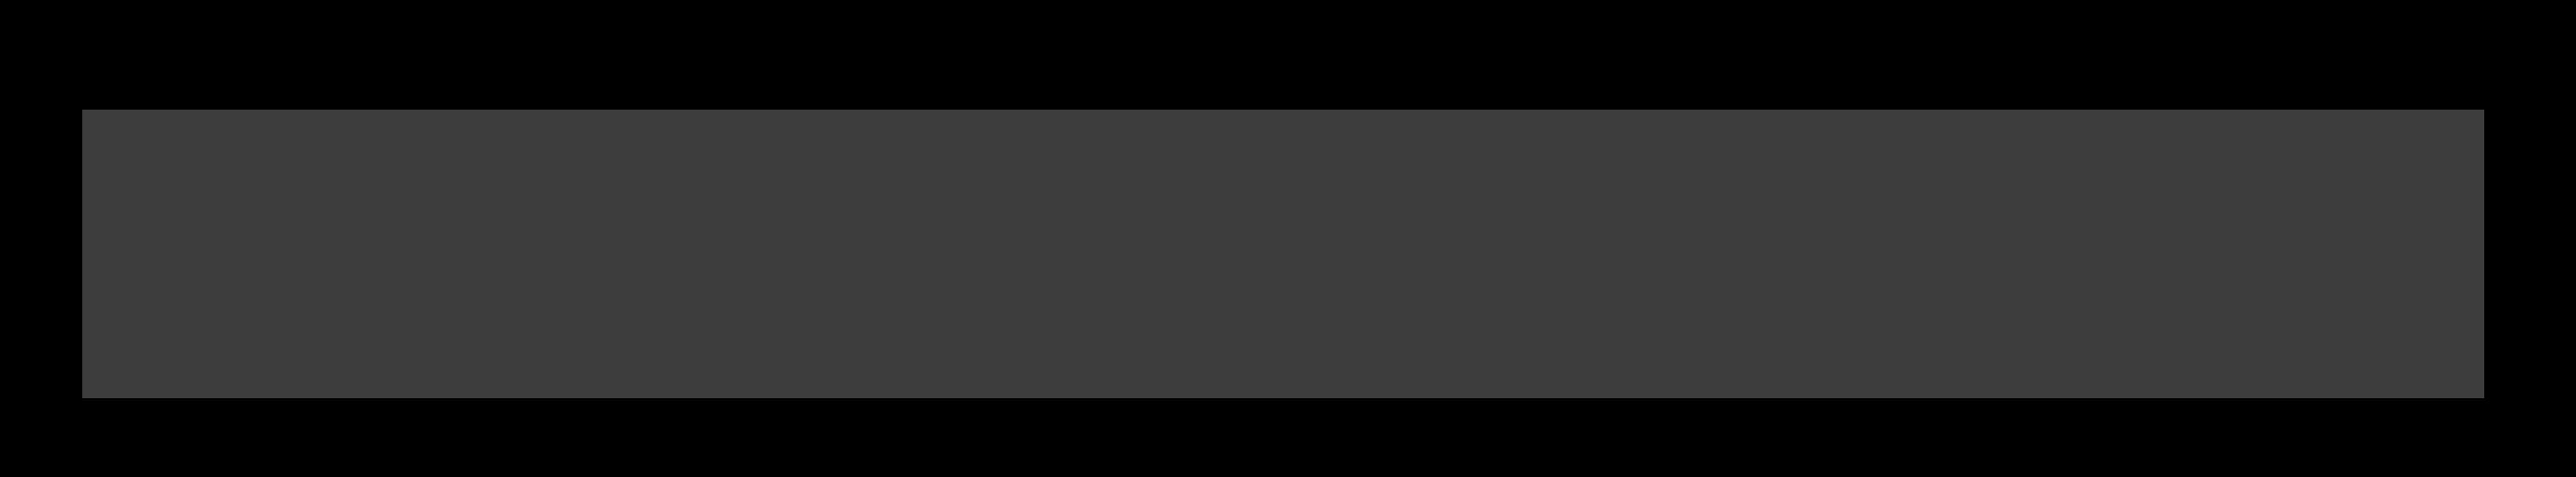 tdg logo with tagline-nobg-06-grayscale